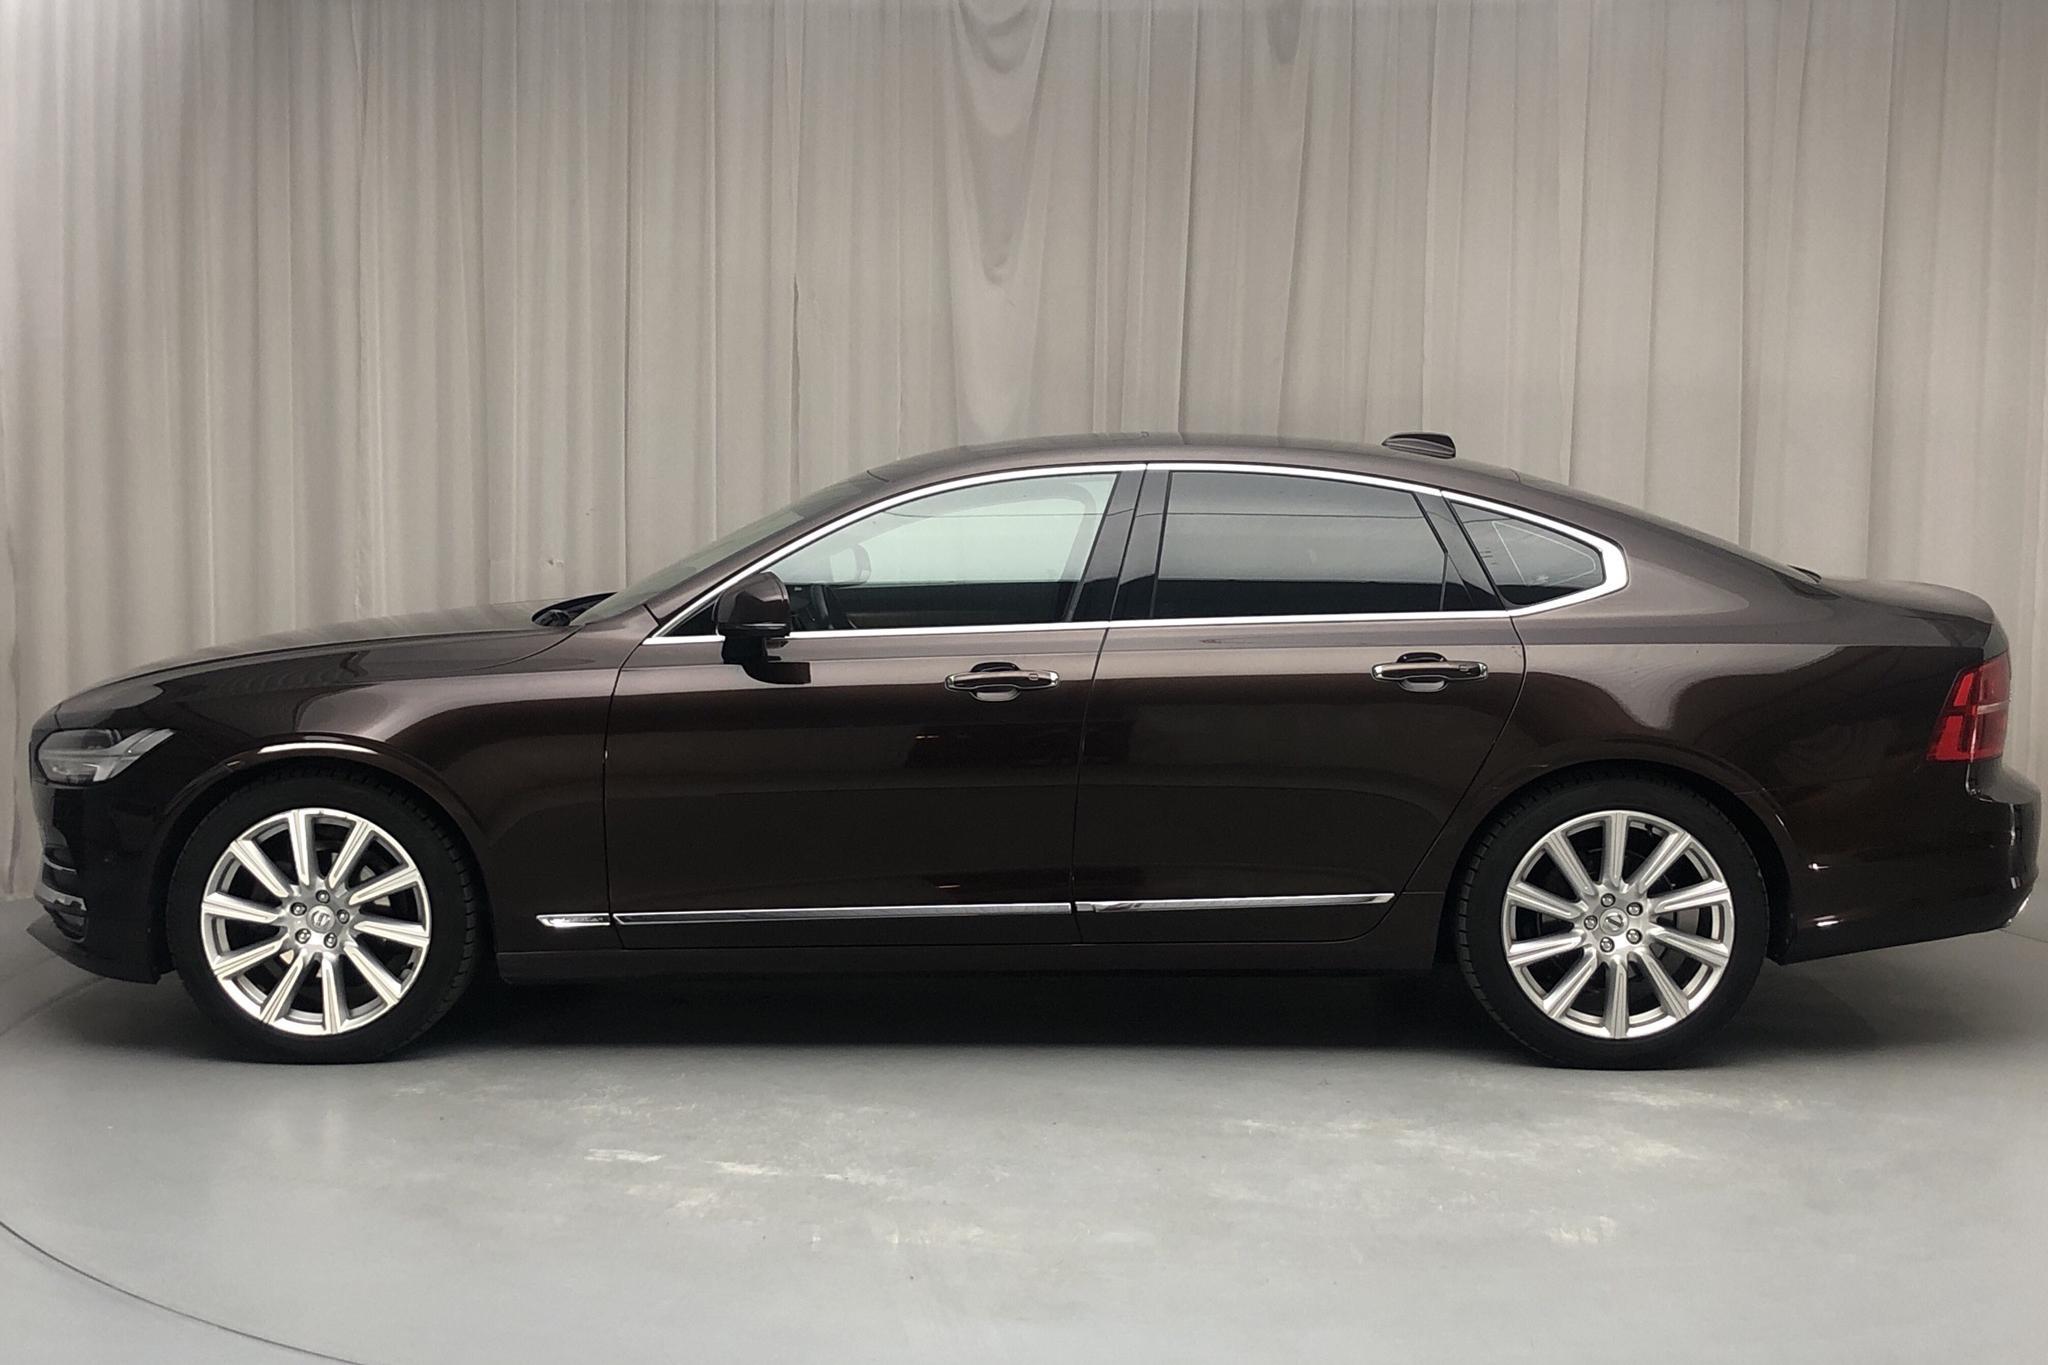 Volvo S90 D4 AWD (190hk) - 10 120 mil - Automat - Dark Brown - 2018